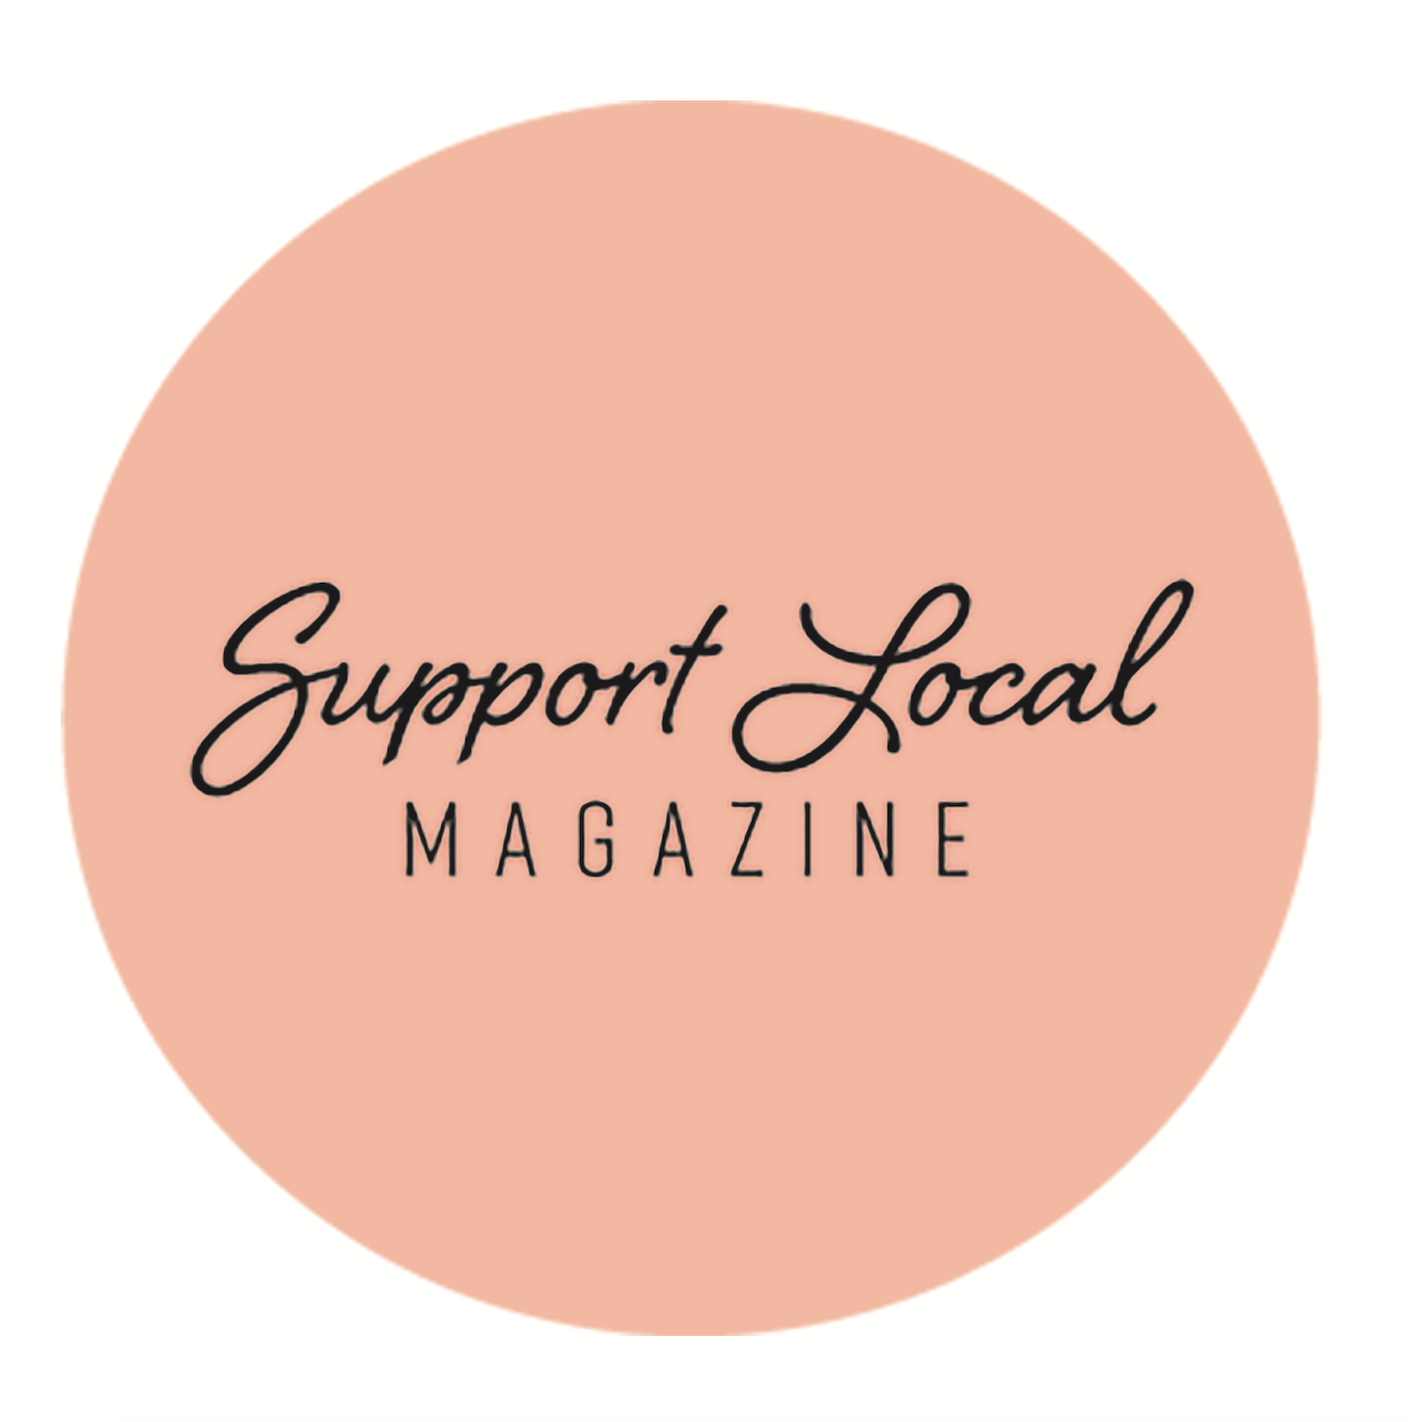 Support Local Magazine